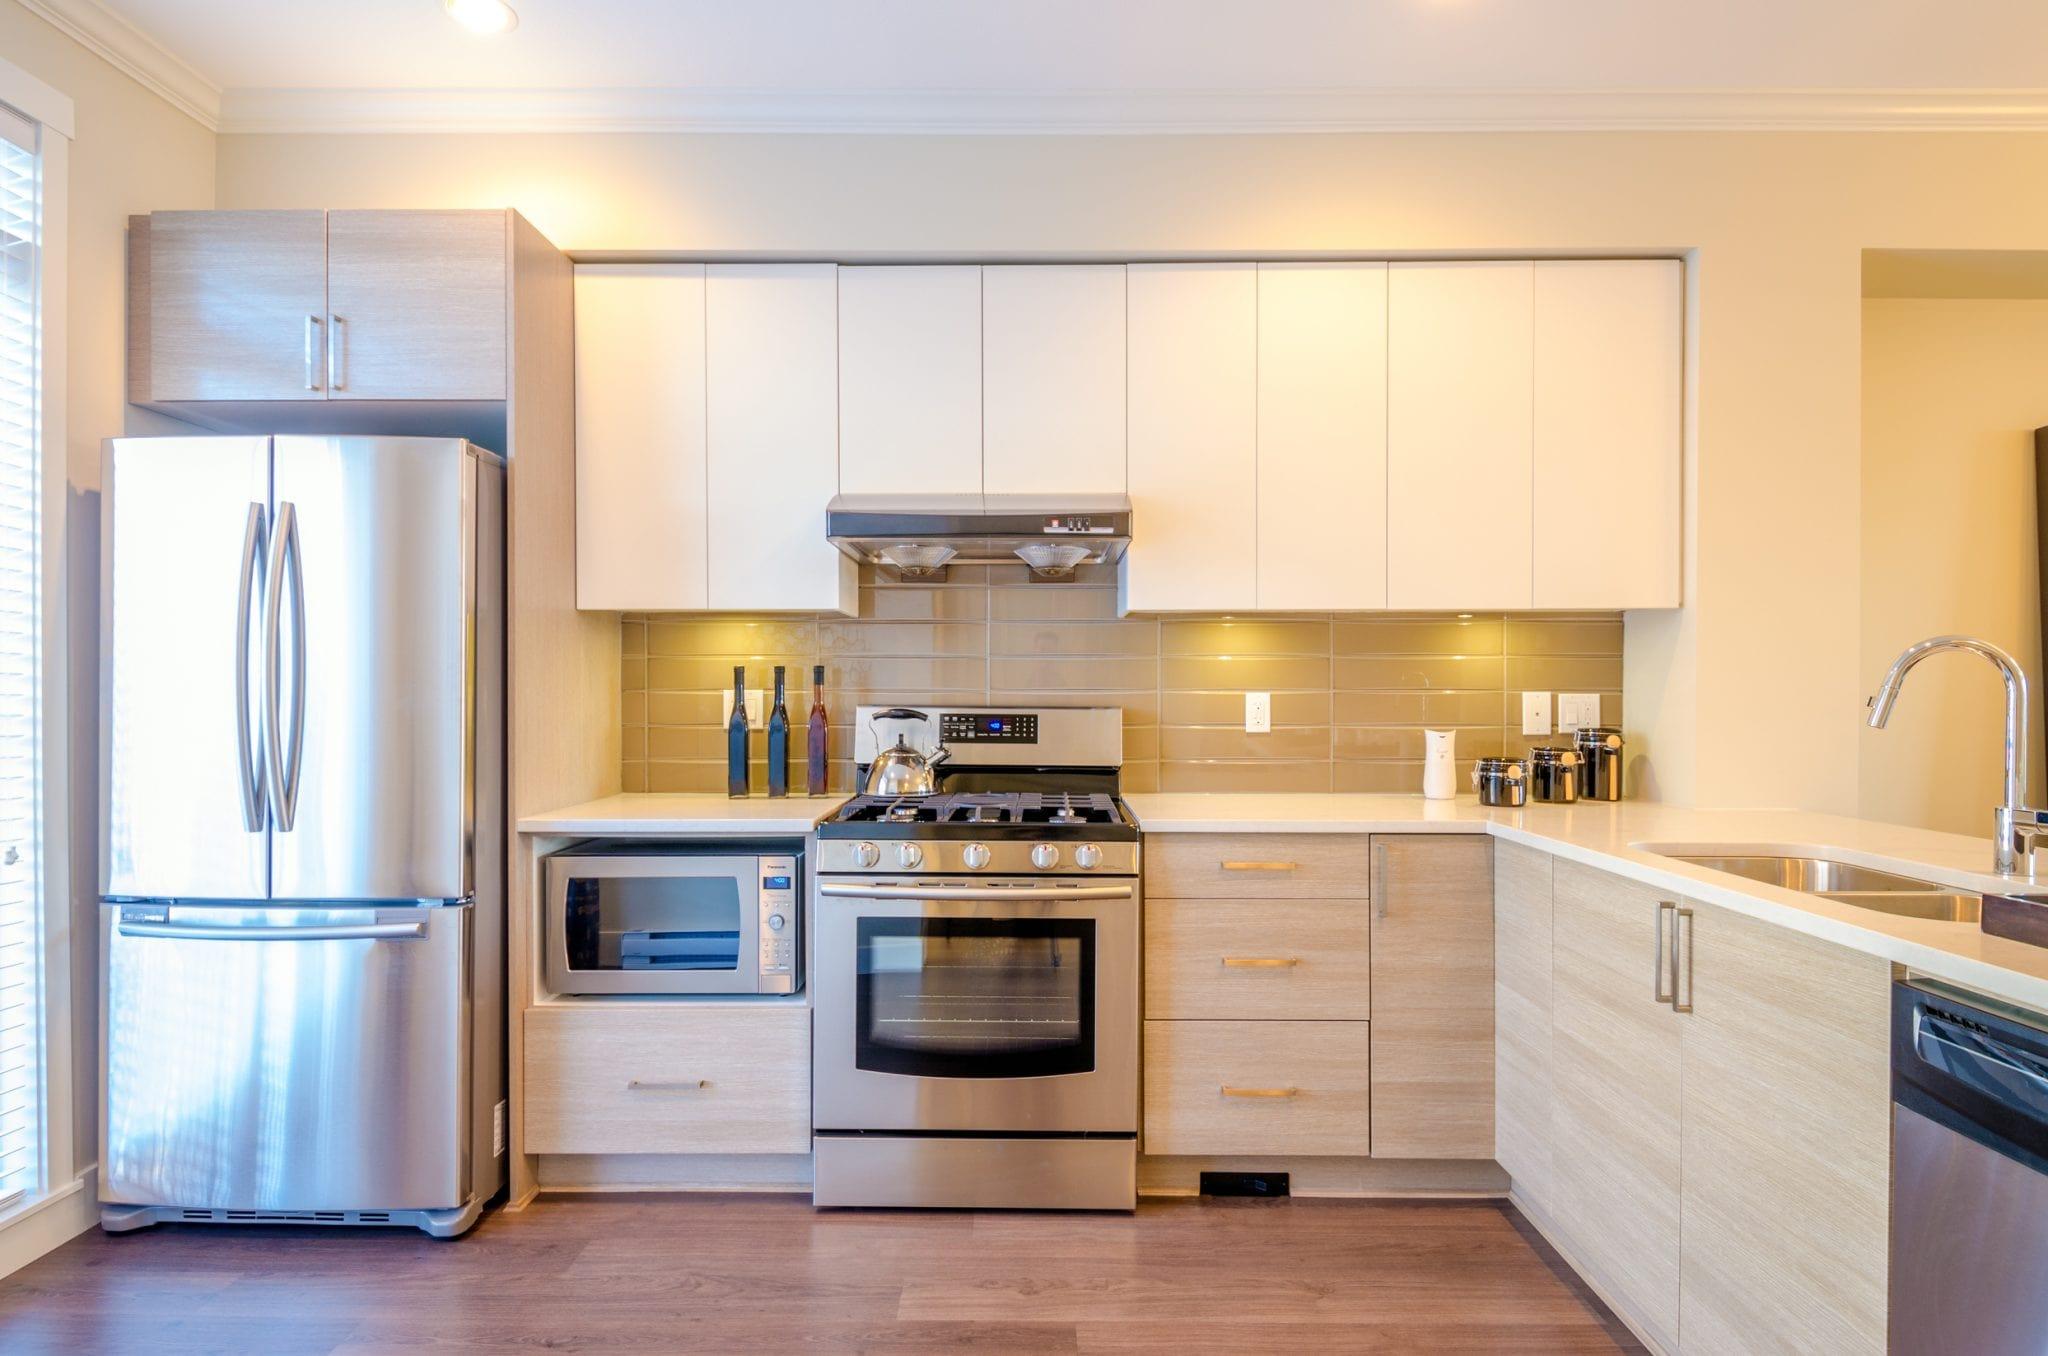 home warranty plan old republic - house design plans